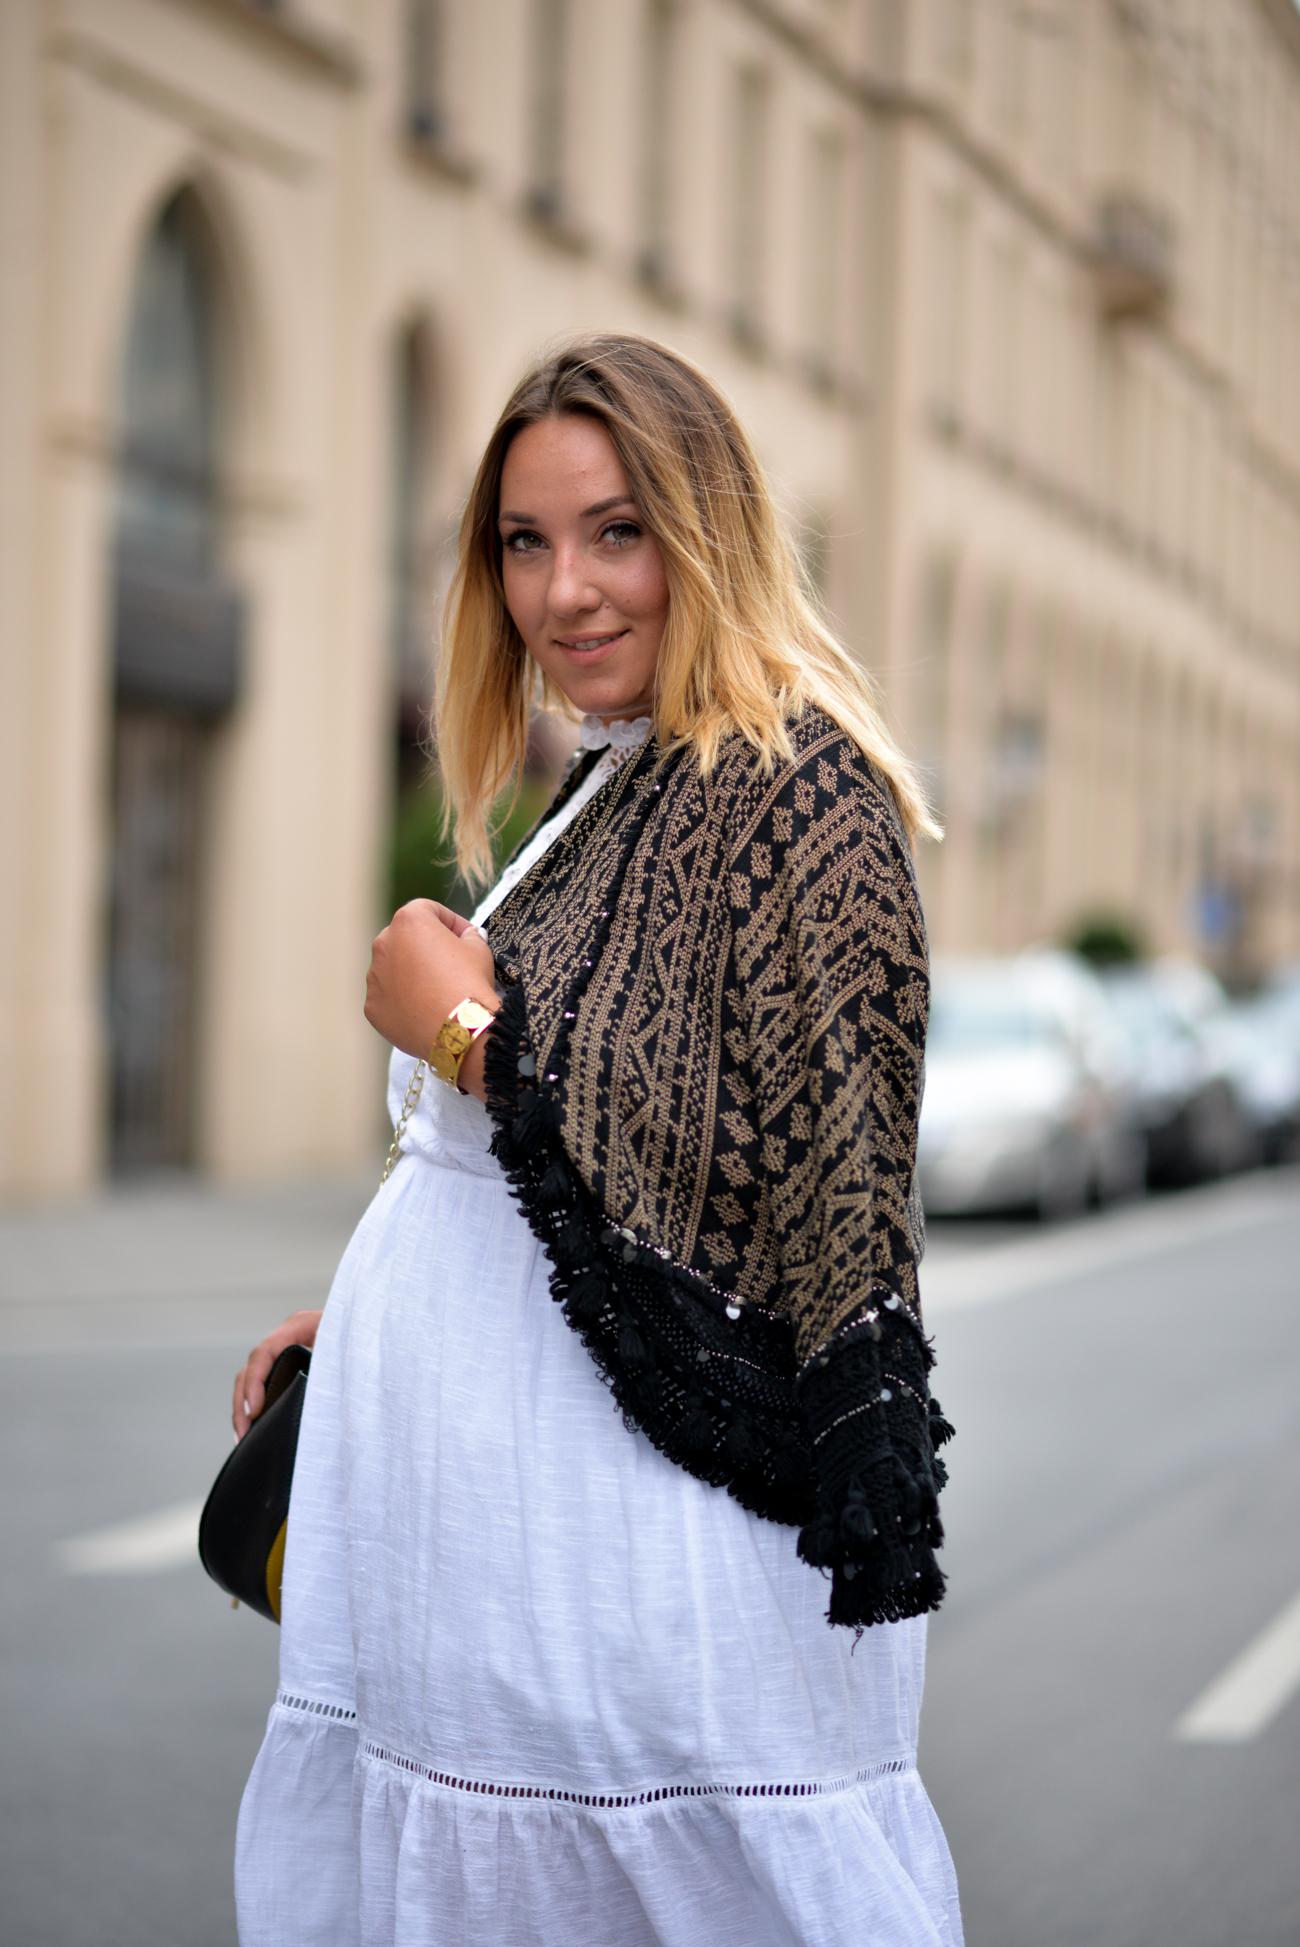 The Skinny and The Curvy One_Plus_Plus Size Blogger_Fashion_Blogger Deutschland_Fashionblogger Munich_Curve (5 von 17)